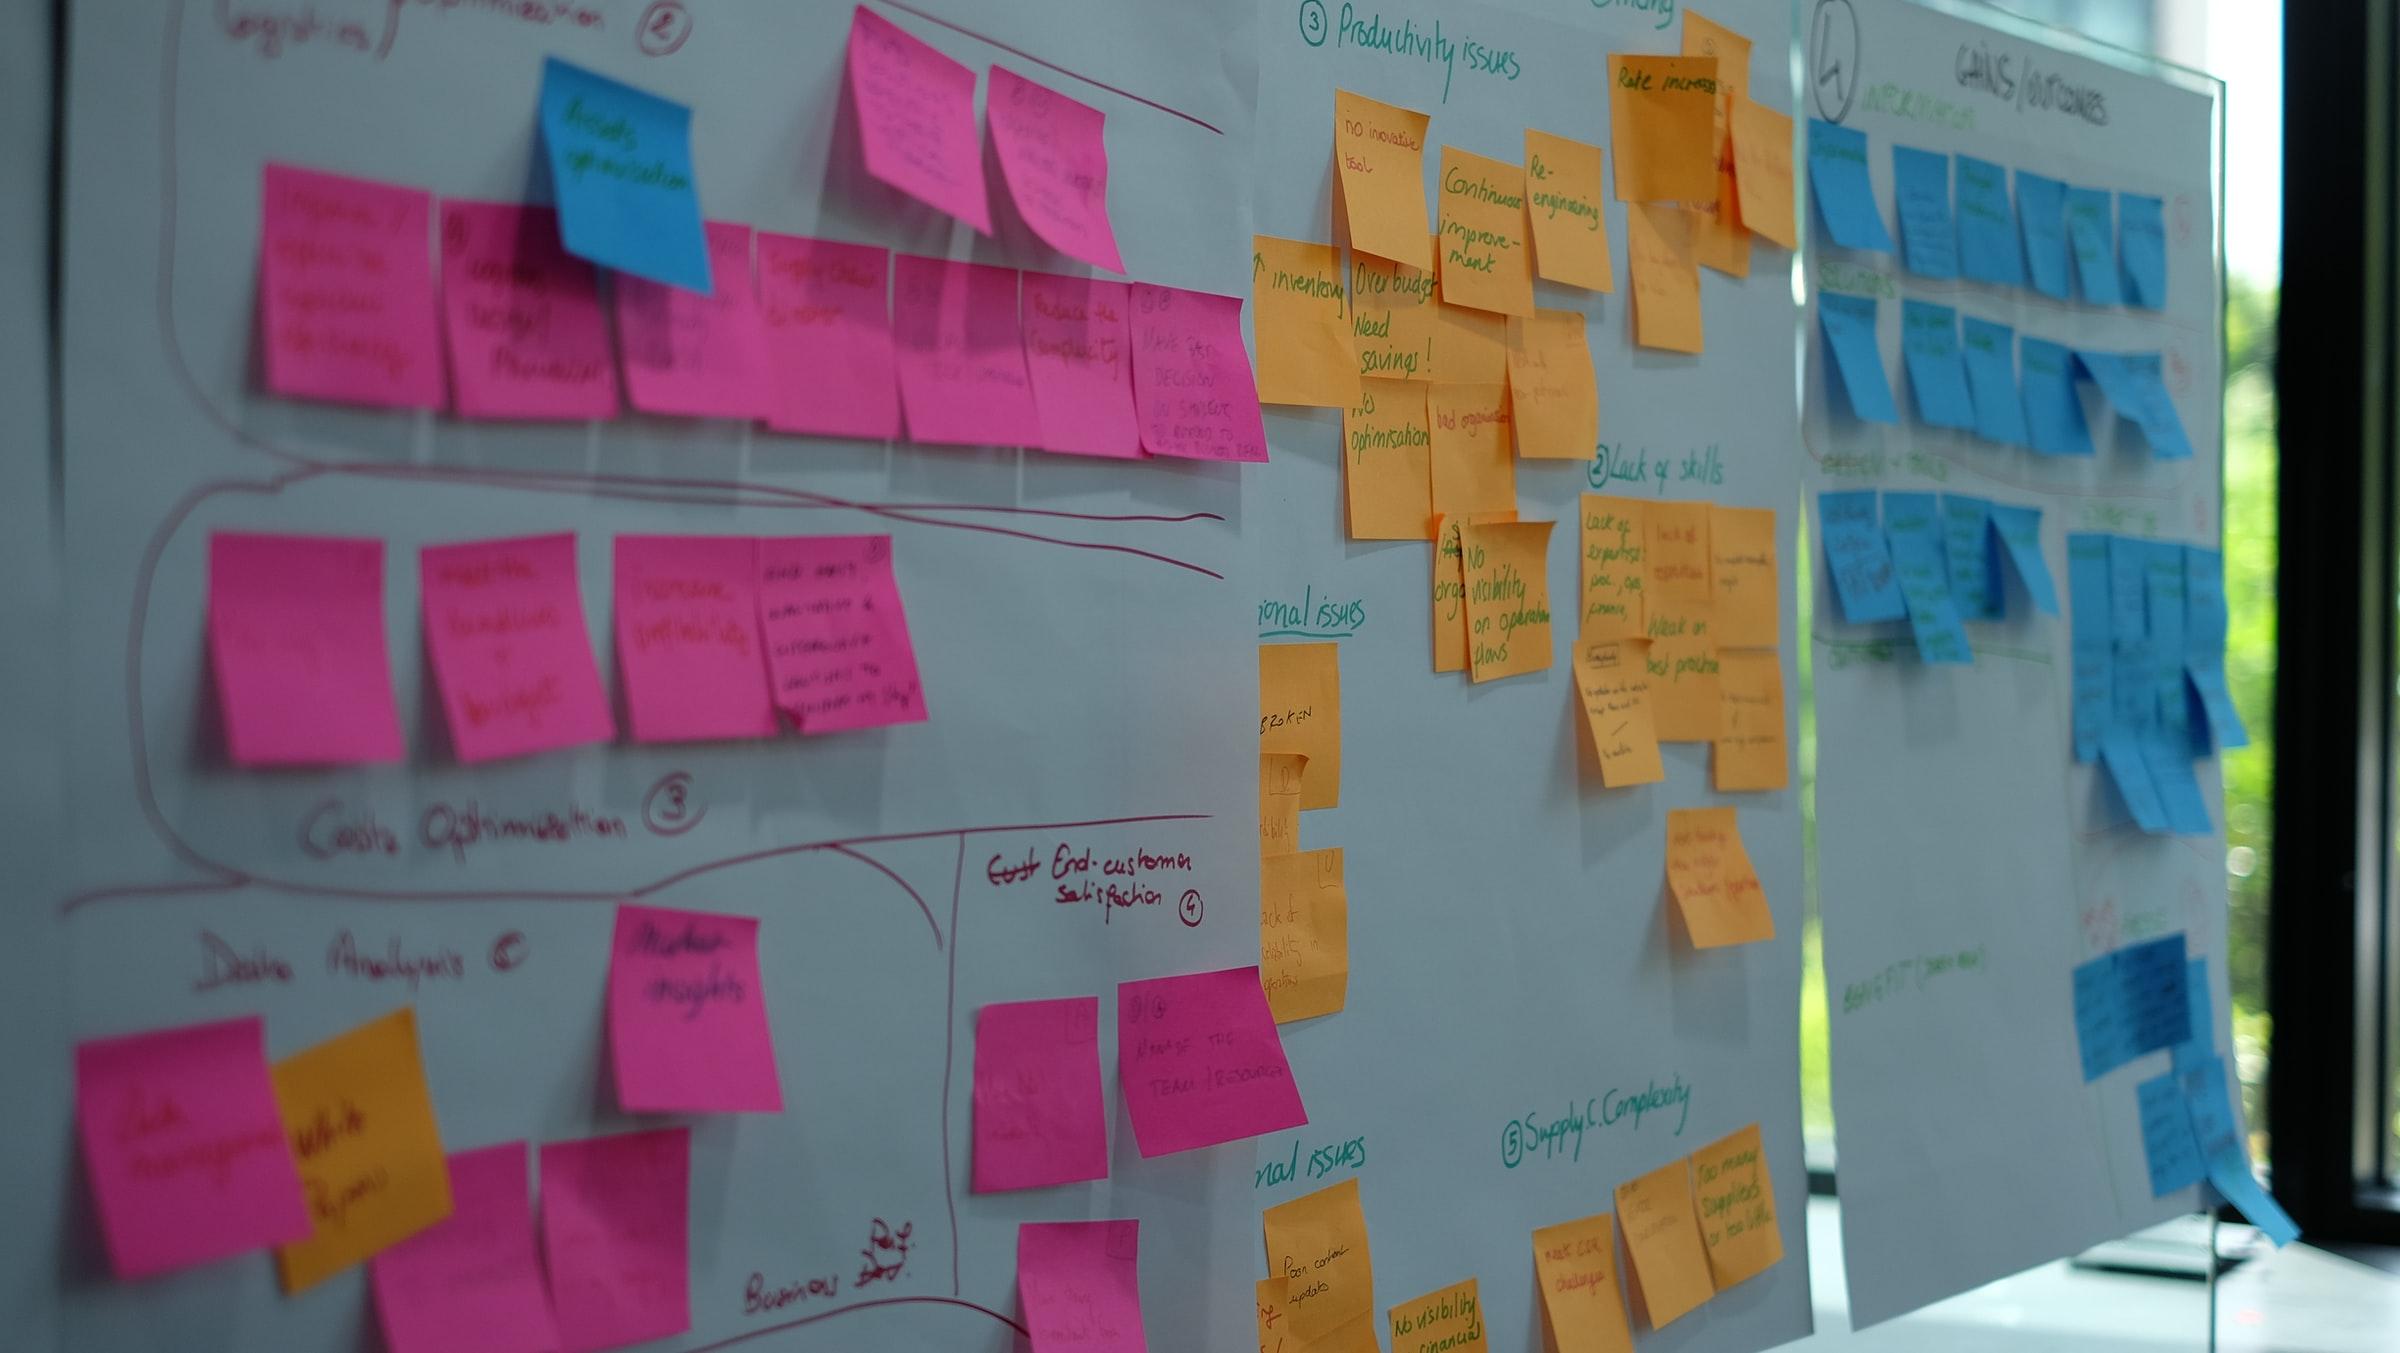 metagorà - business model canvas